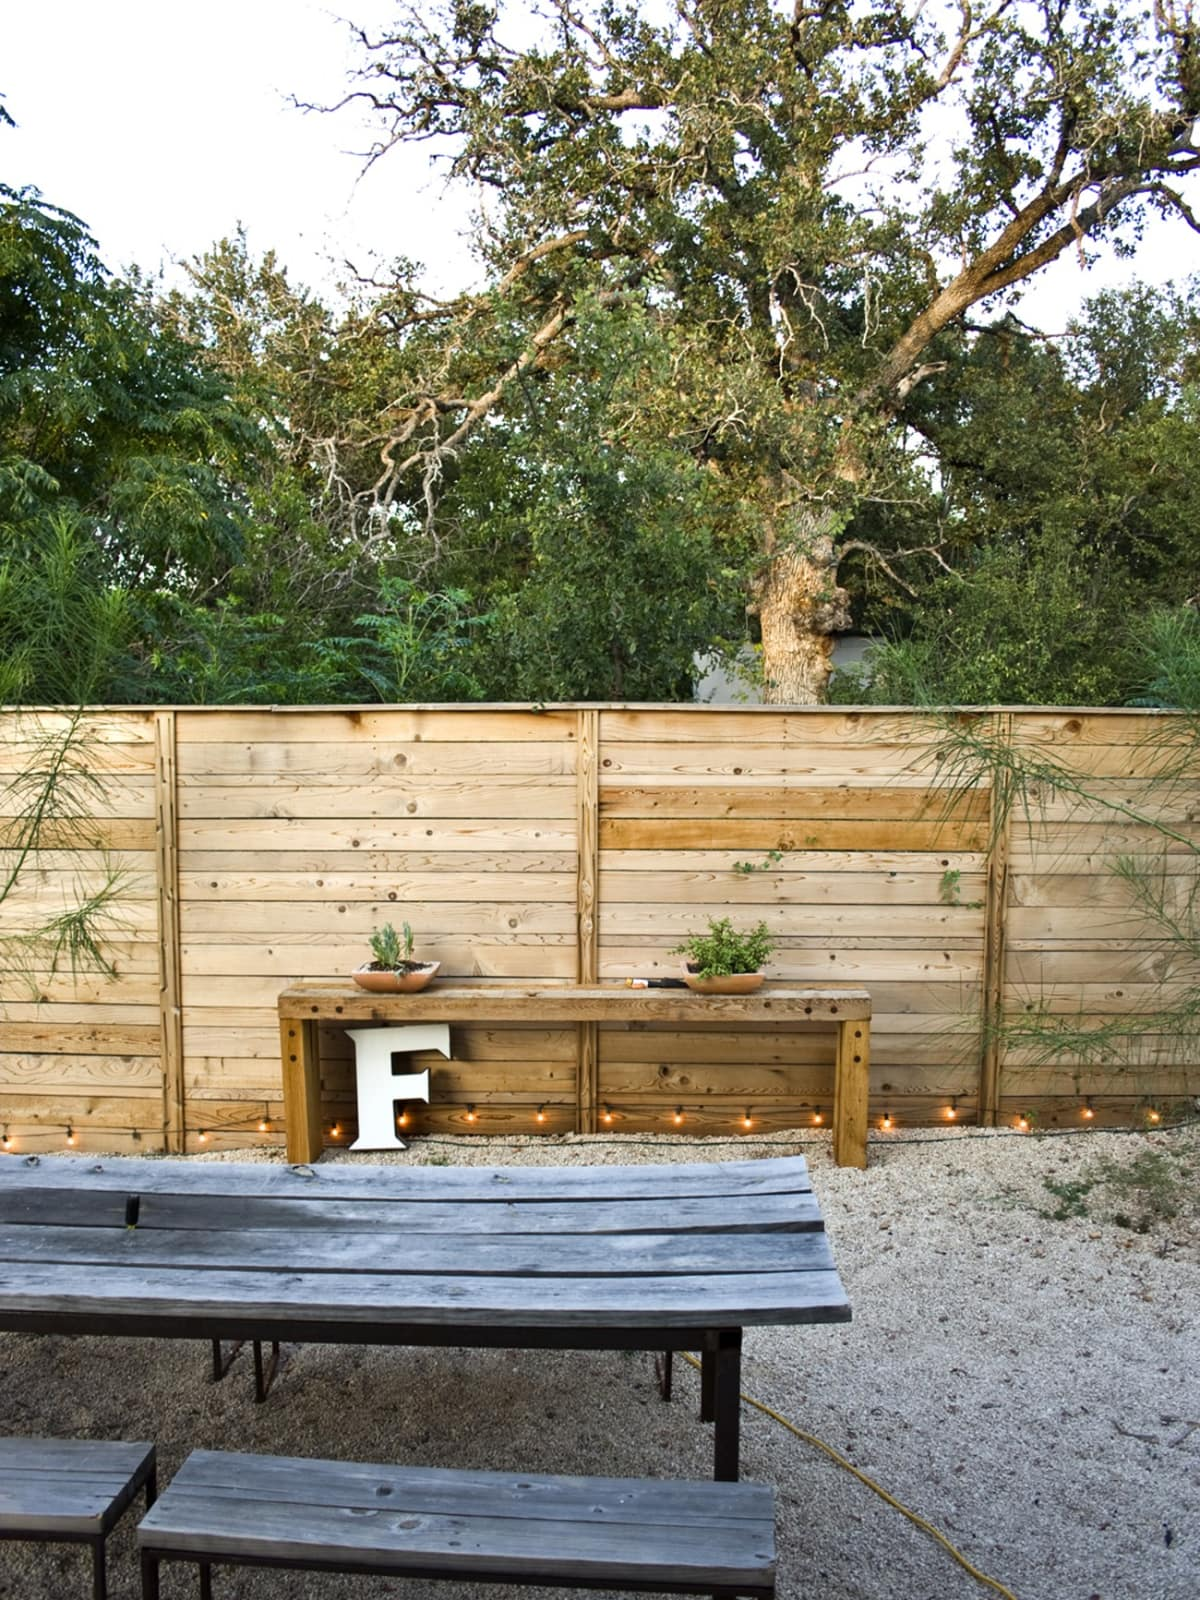 Amazing Austin Backyard Moontower Design Build Image 1